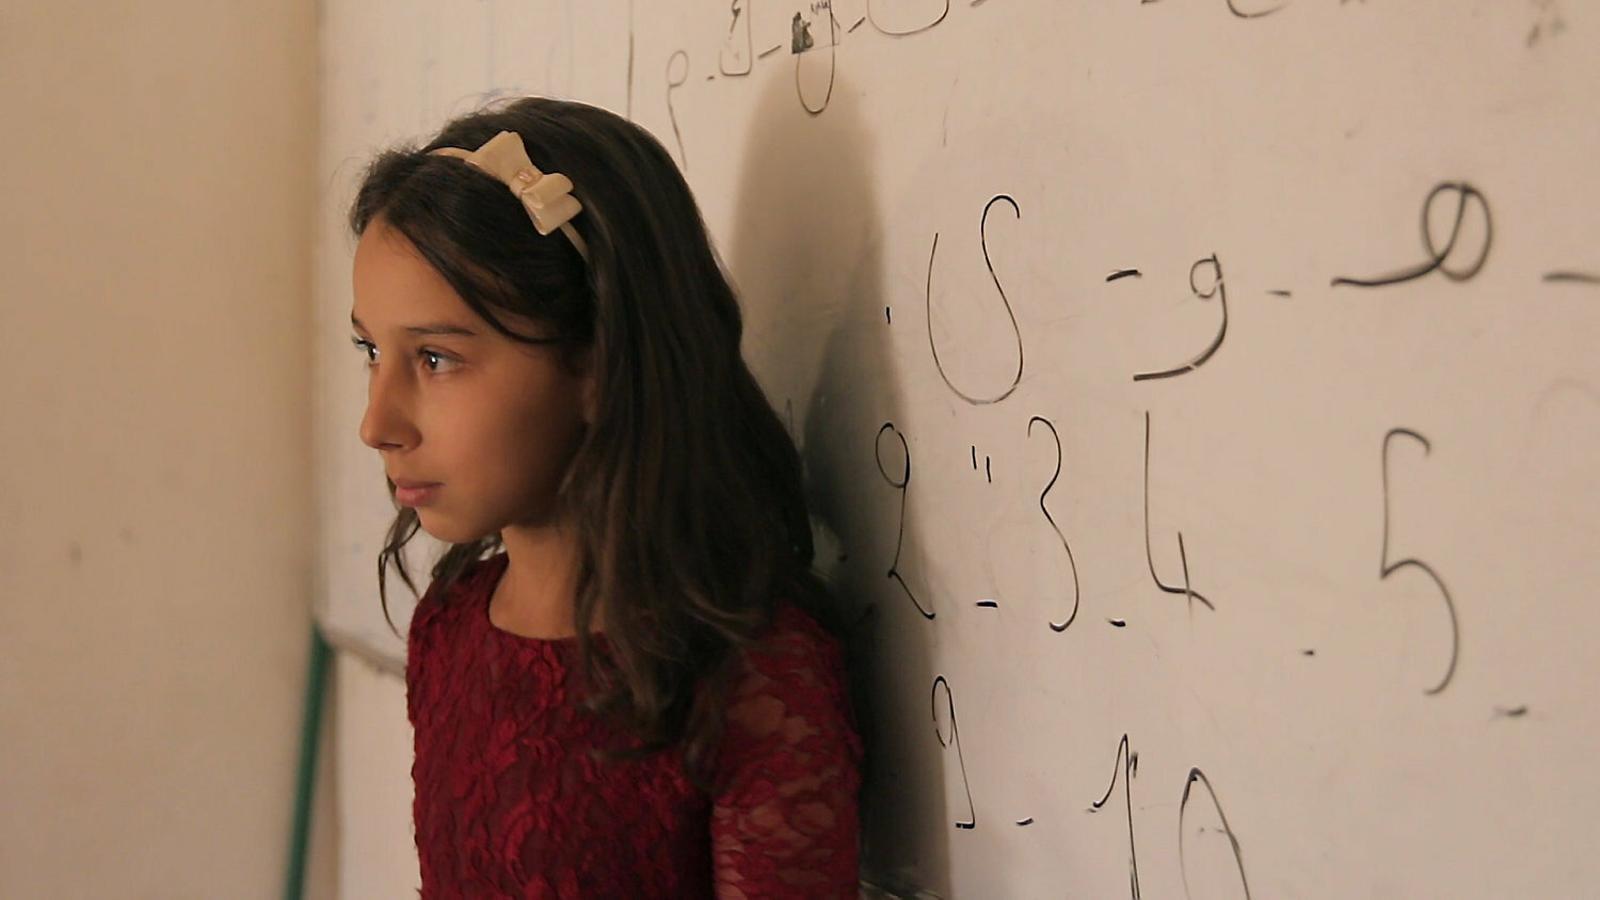 Una nena en una classe de llengua amaziga.